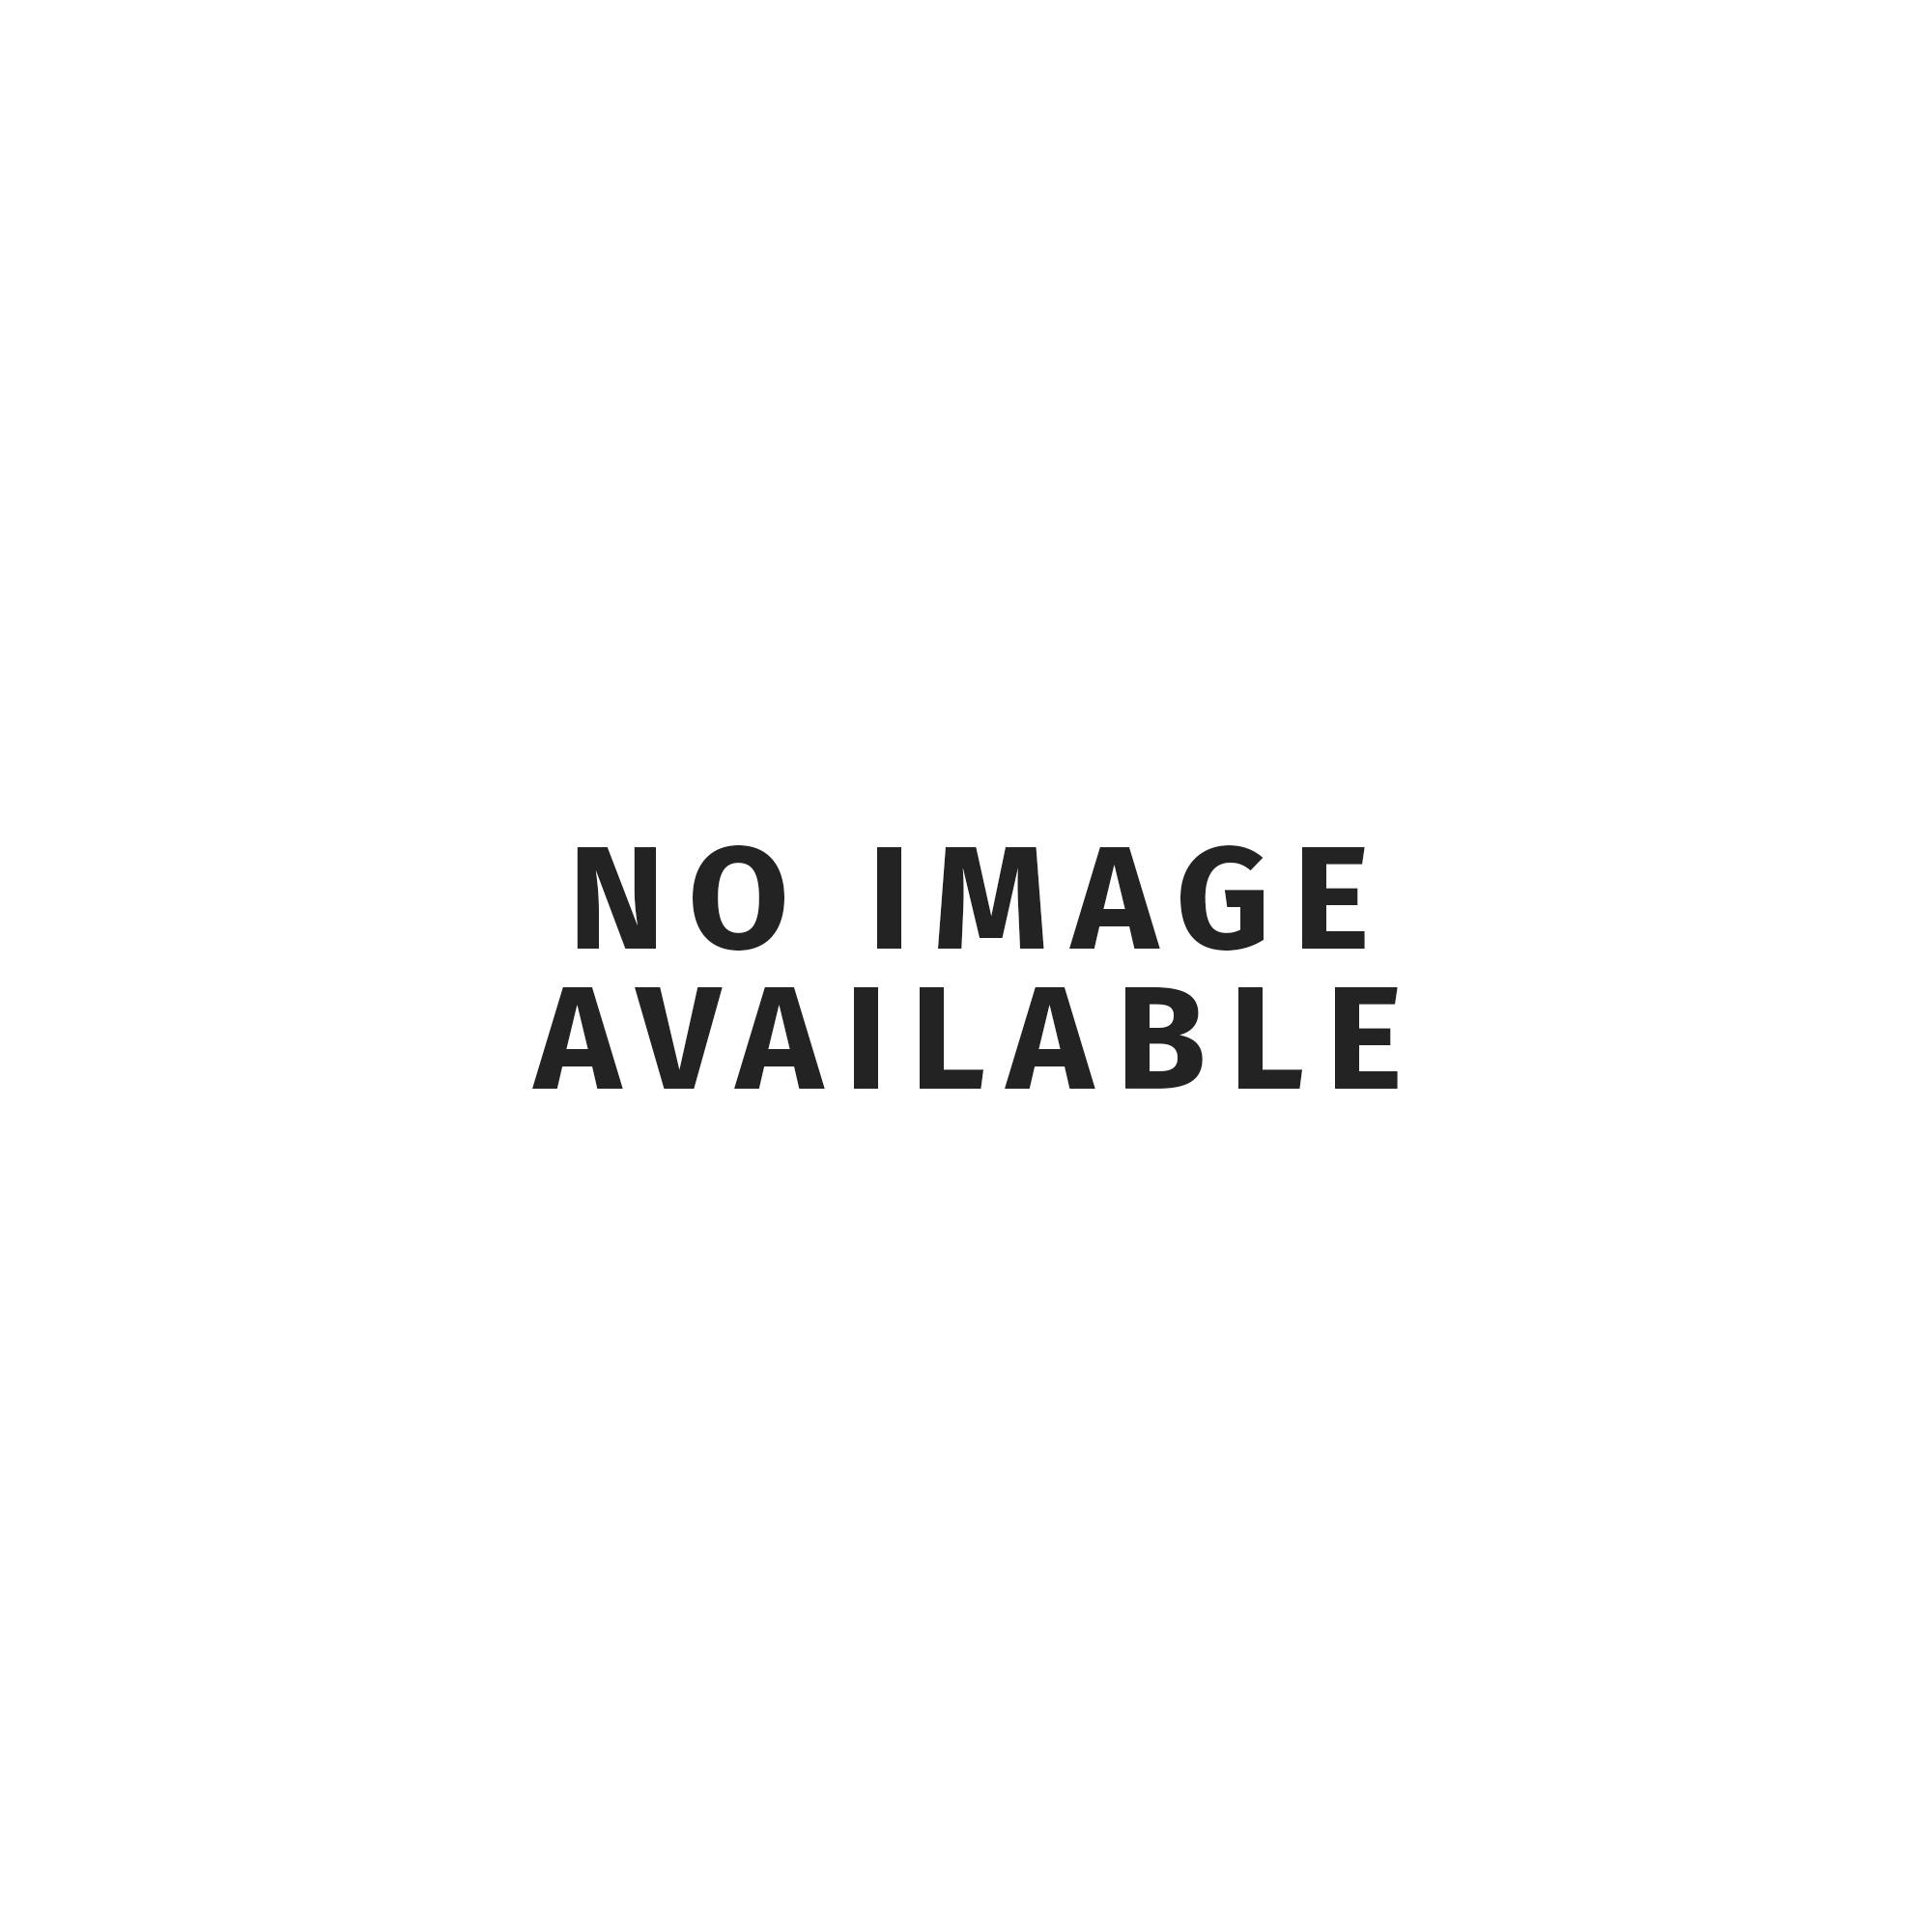 Fairdale Weekender Canti Hybrid Bike 2014